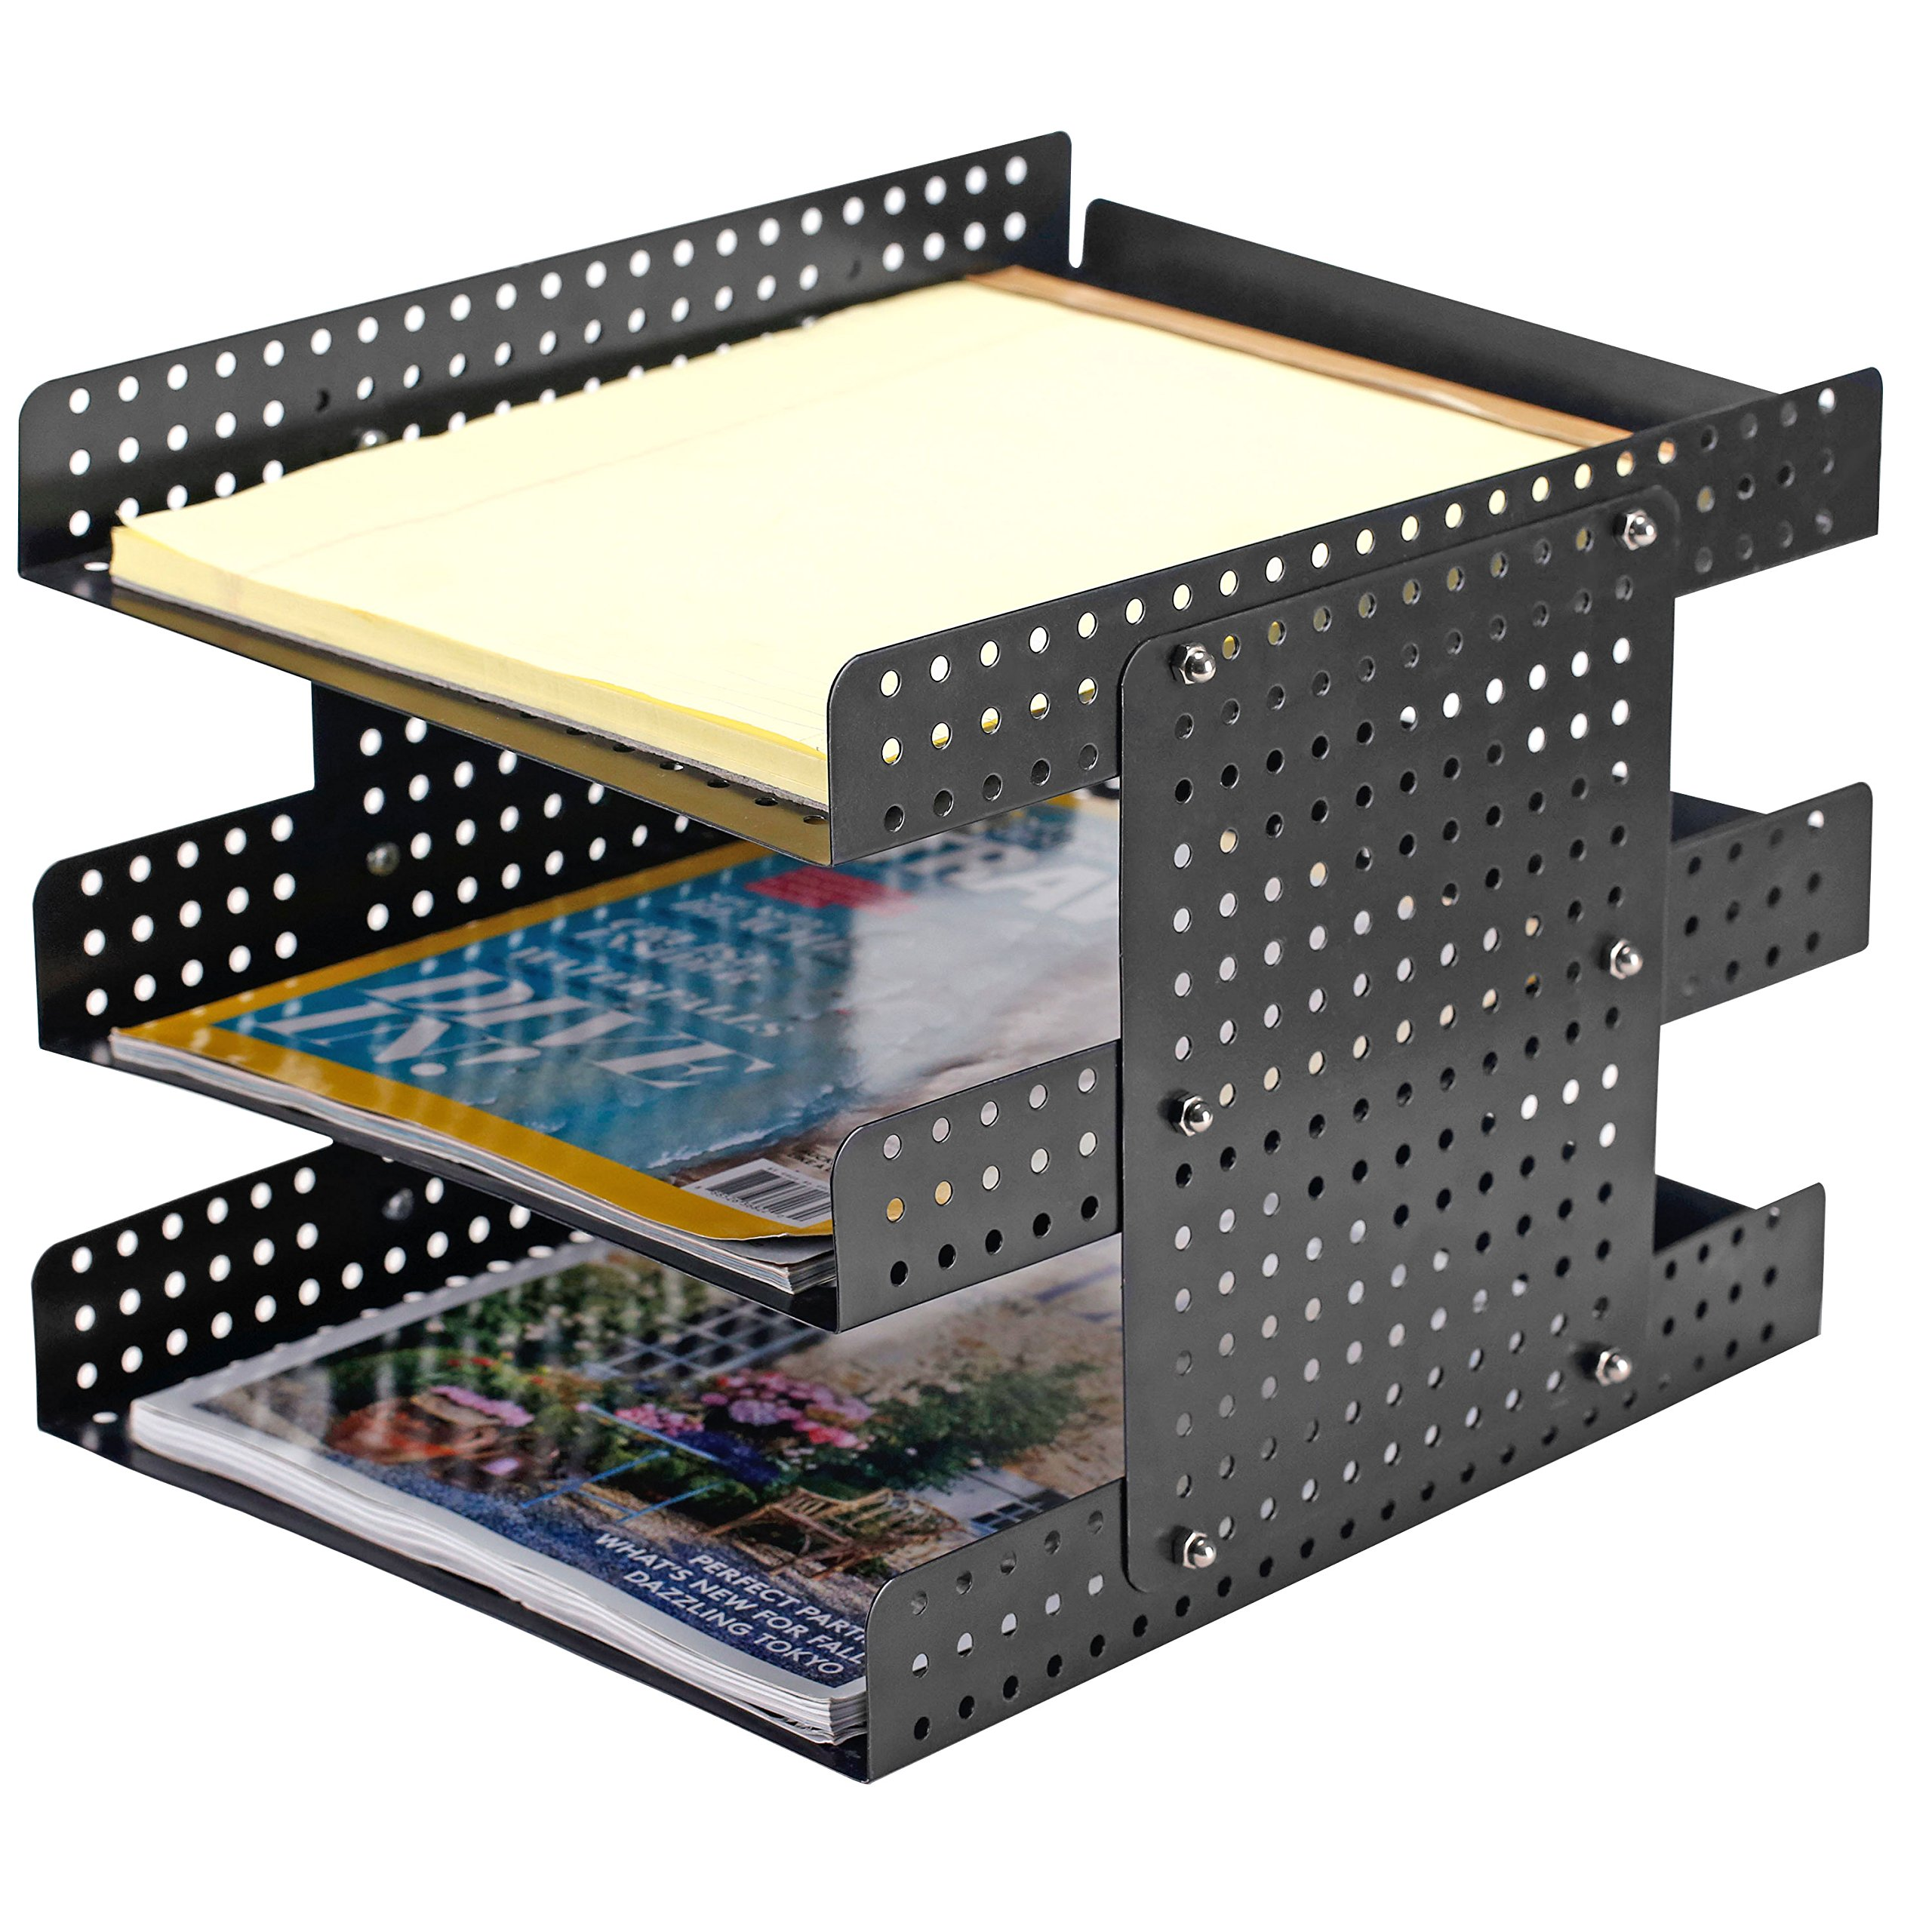 3 Tier Metal Document Tray, Desktop File Holder with Adjustable Height Design, Black